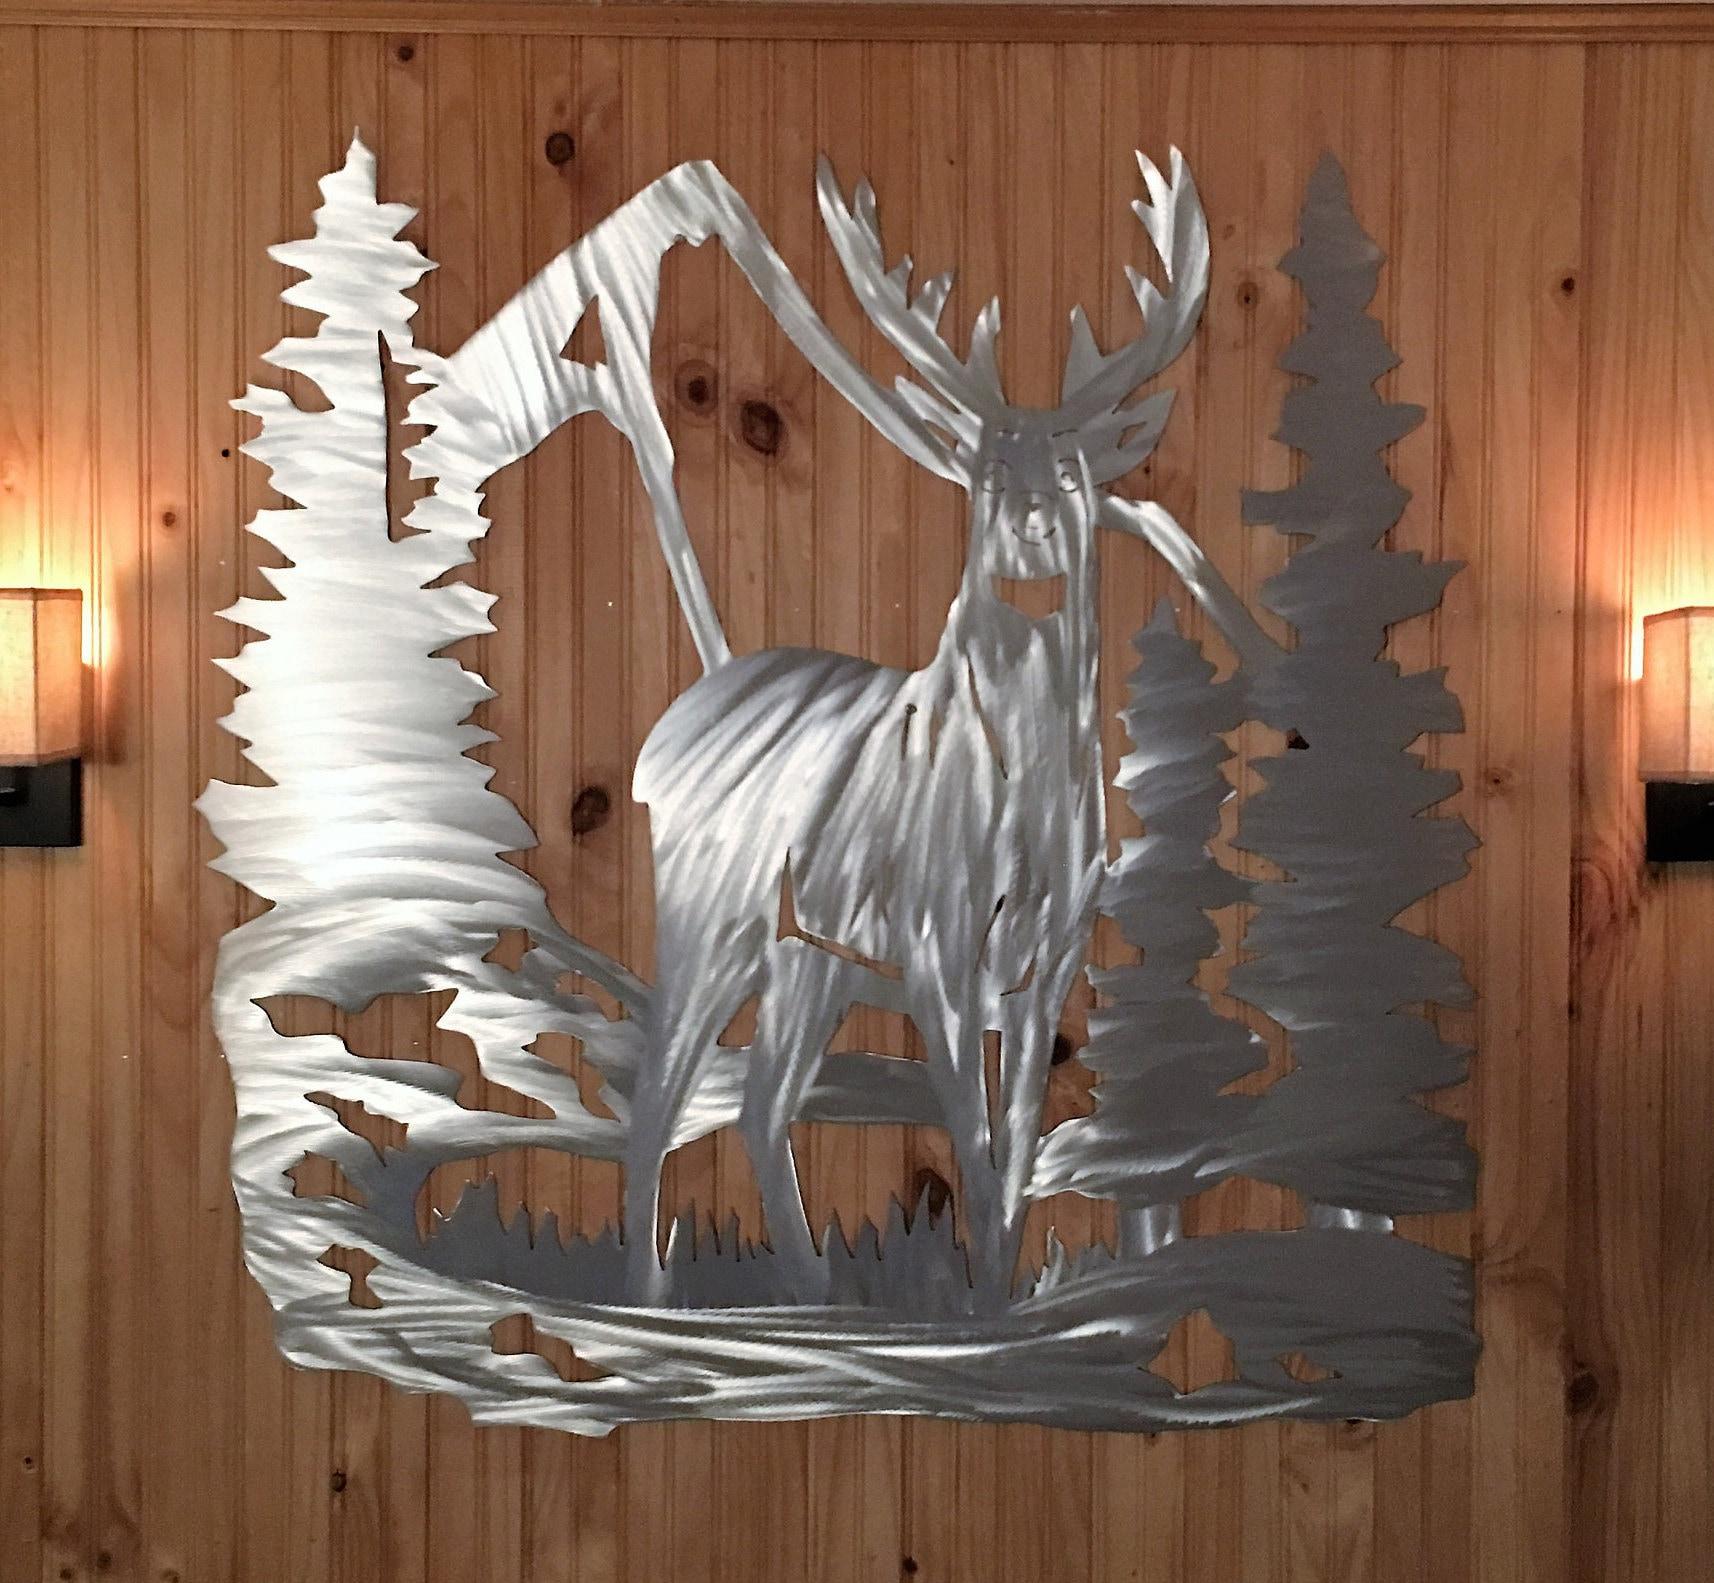 Modern Home Decor. Deer. Nature Inspired. Metal Wall Hanging ...